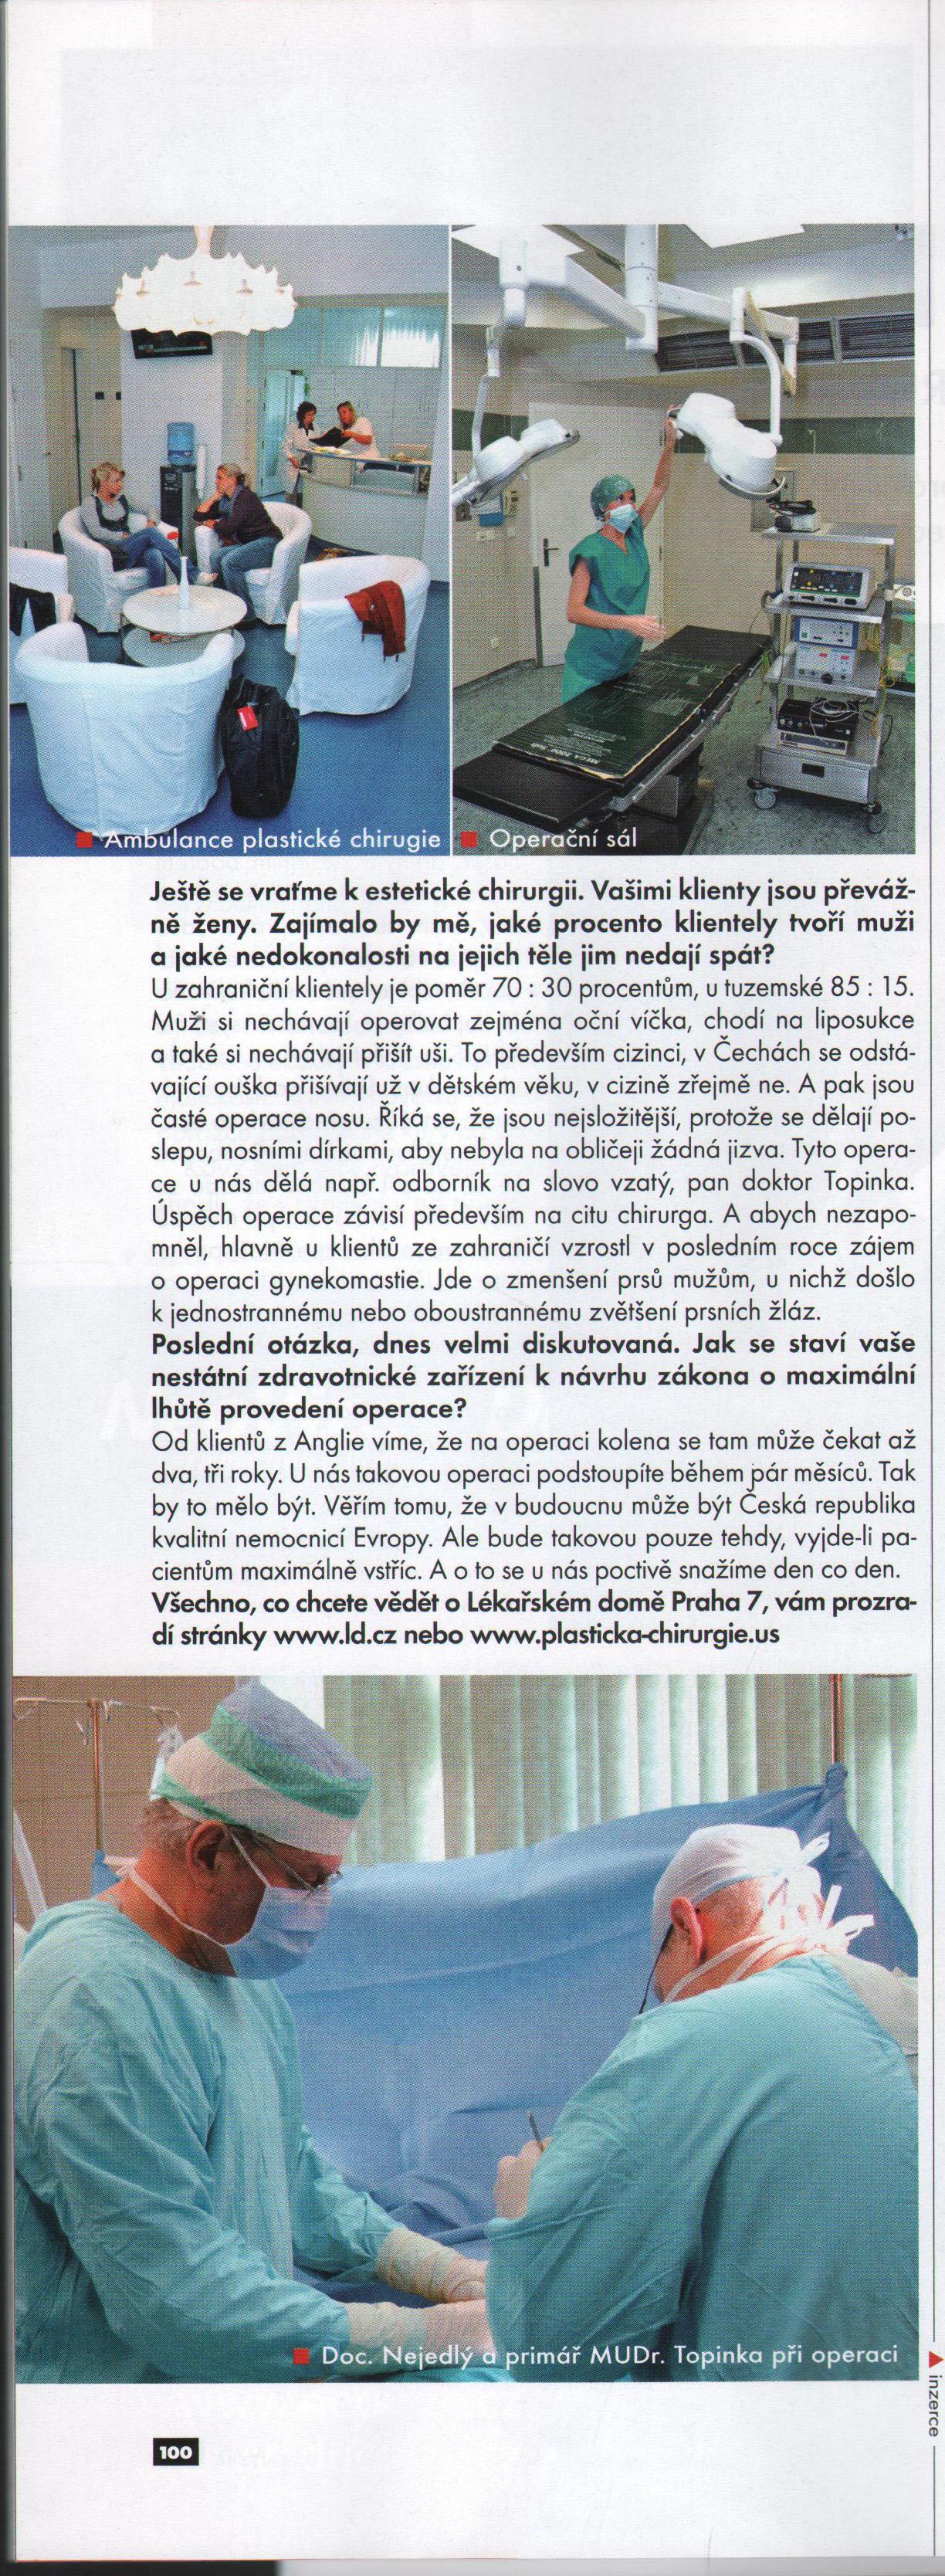 Xantypa březen 2012 článek str. 100 2